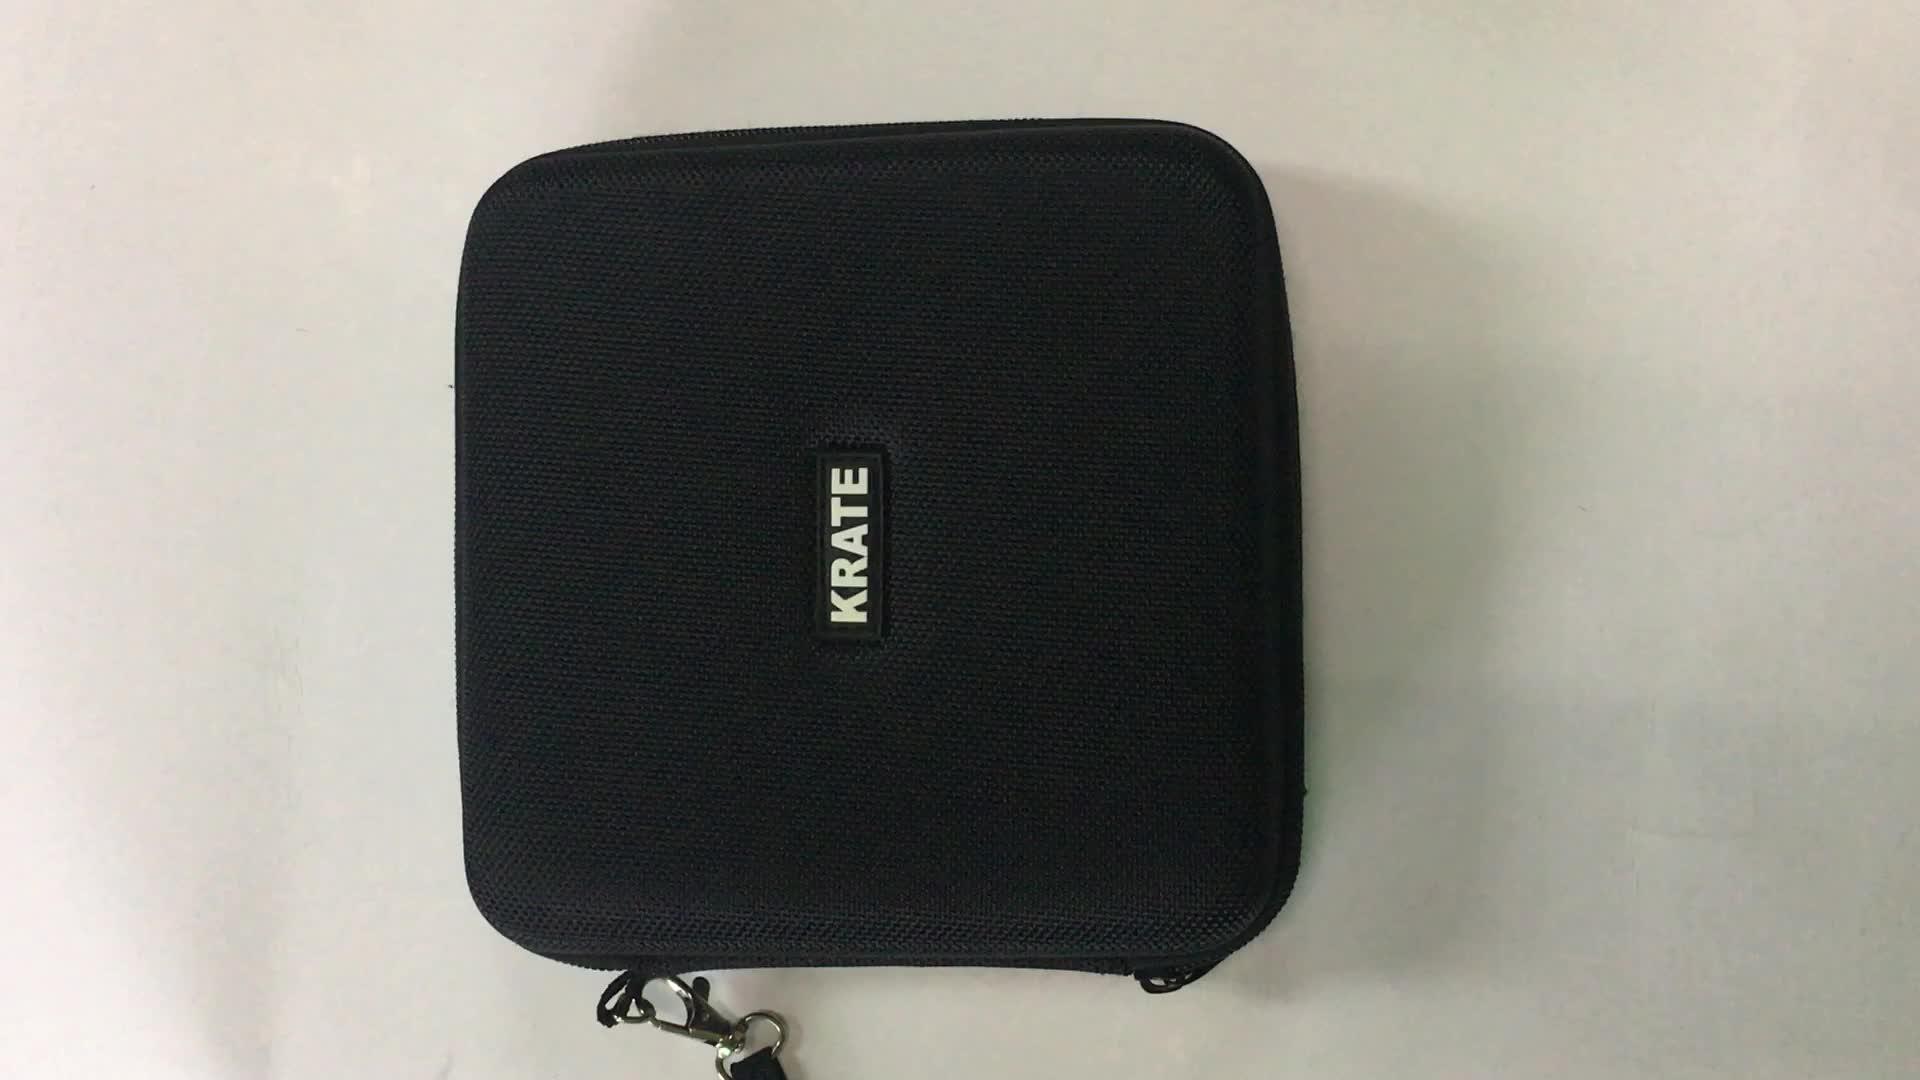 Handle 1680D square shape carrying EVA digital hardshell case